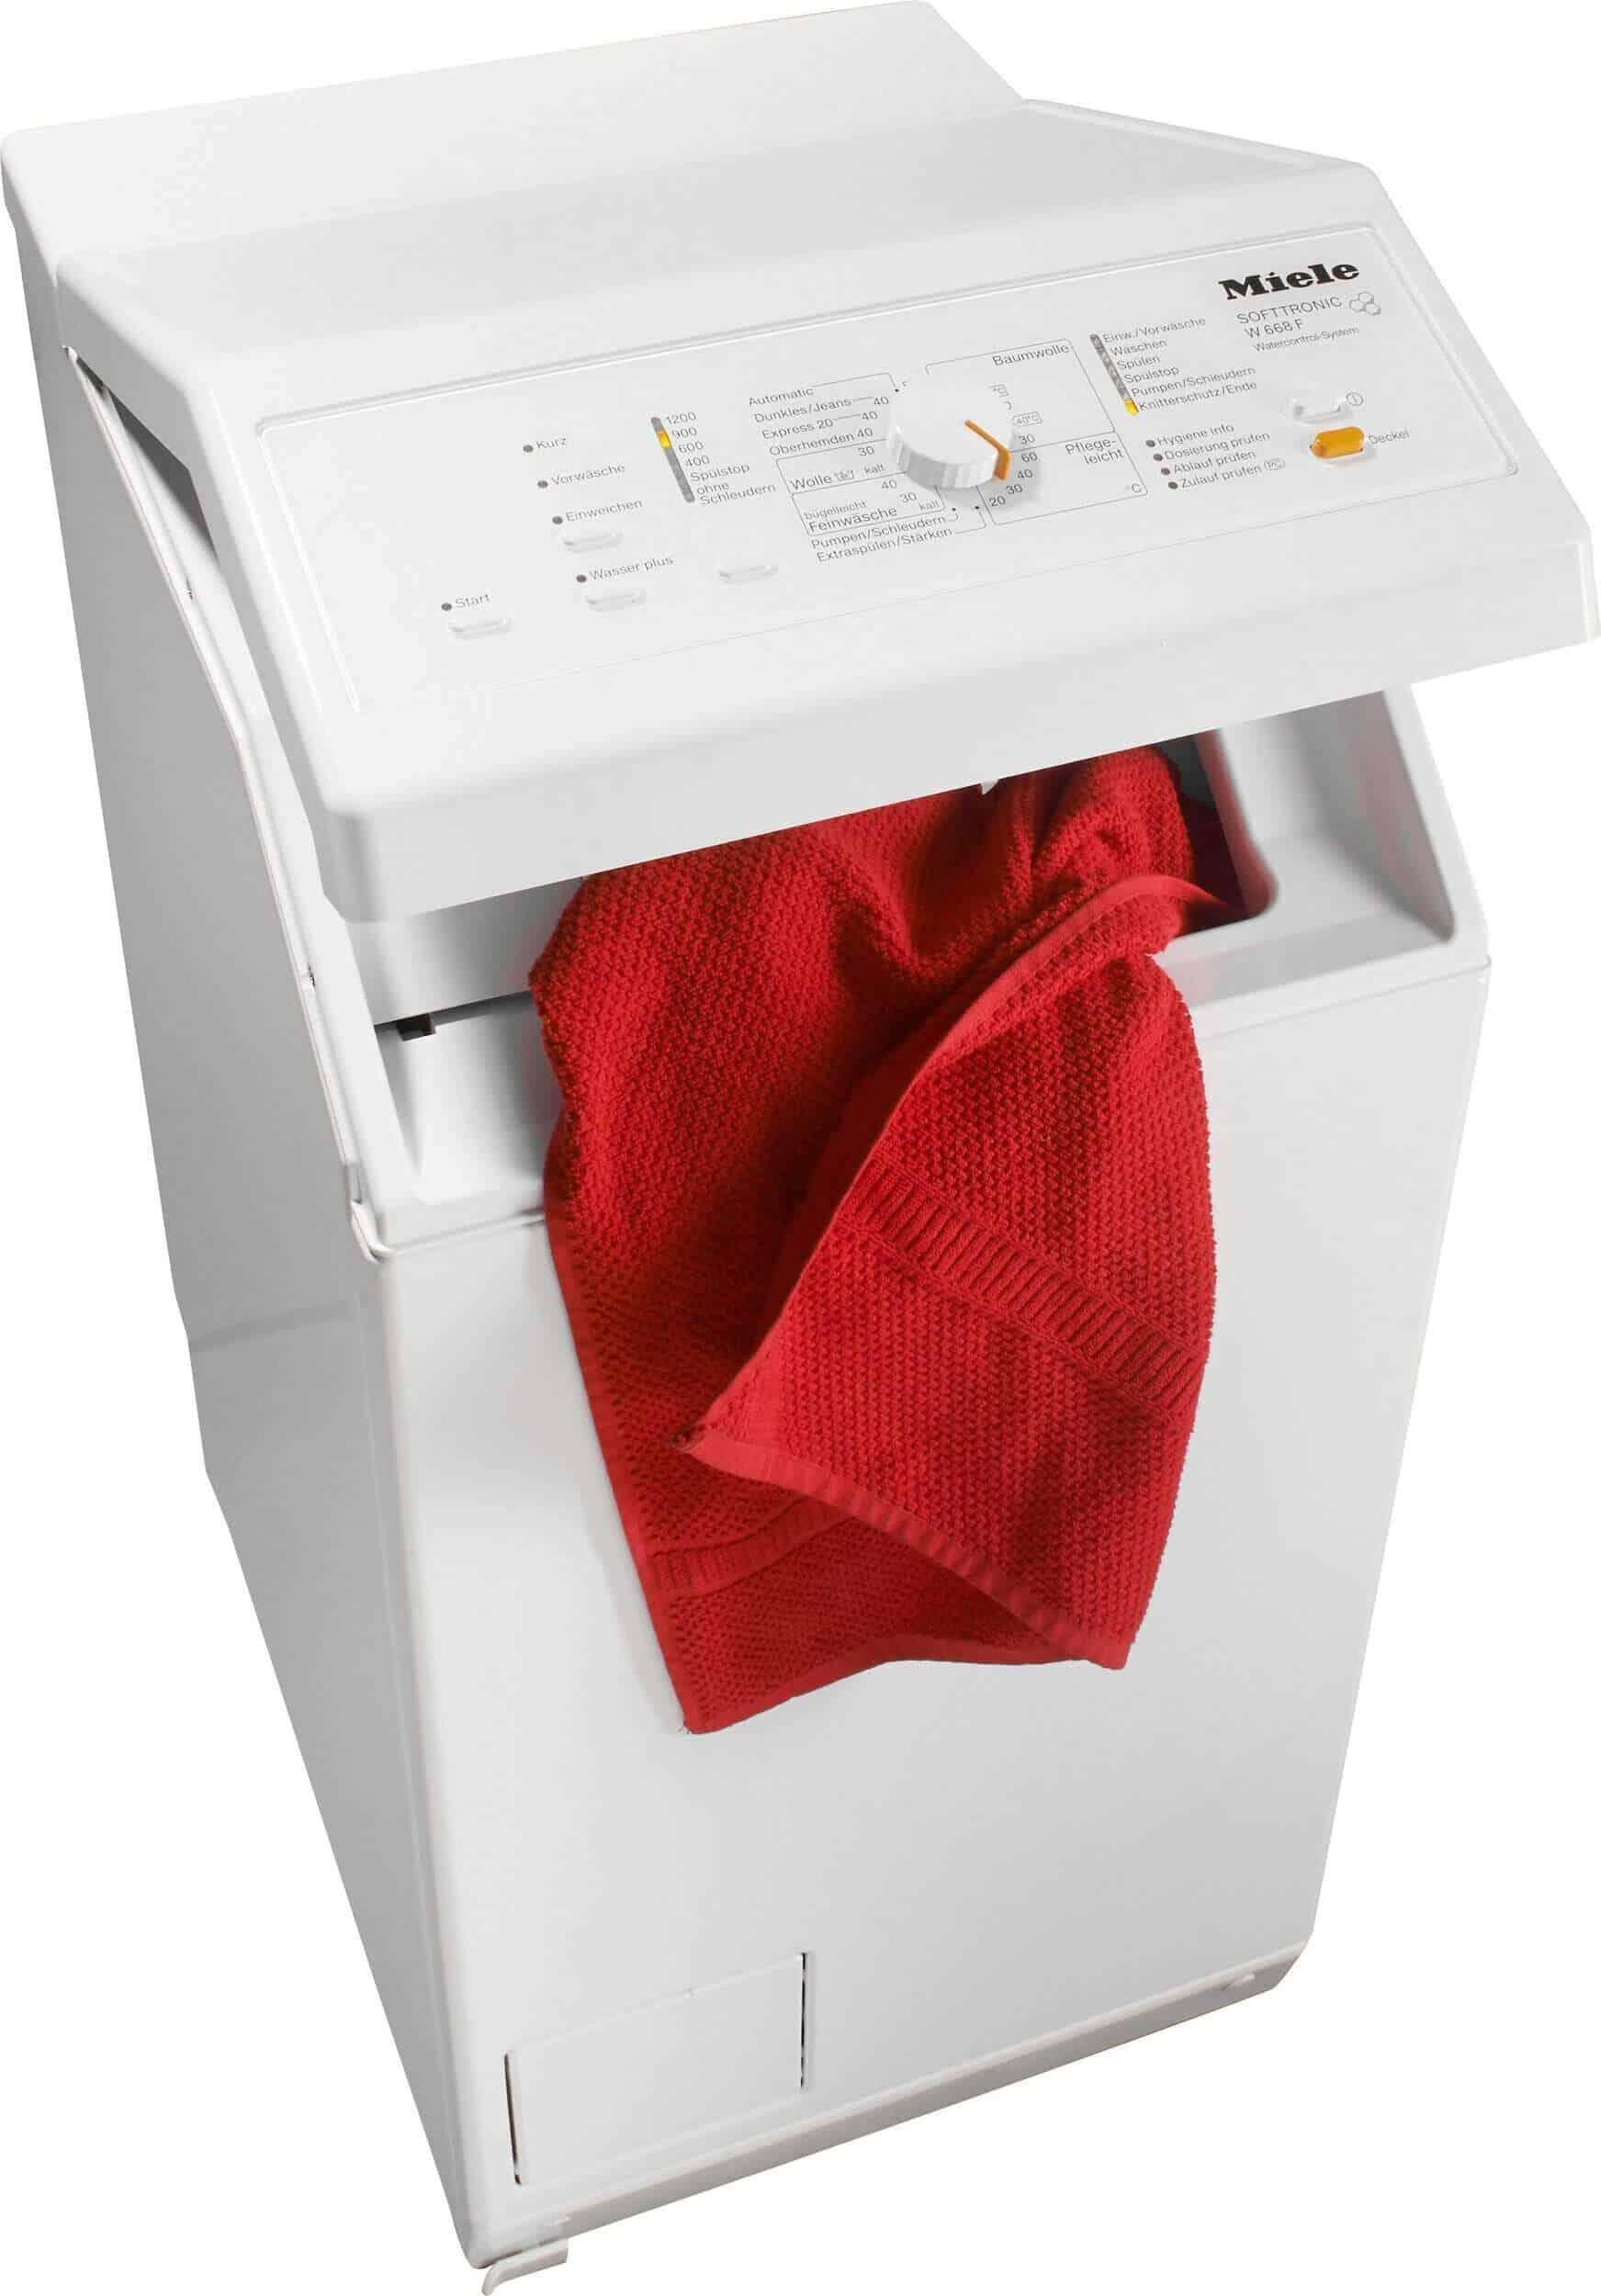 Super Miele W 668 F Wcs Waschmaschine im Test 02/2019 MR85